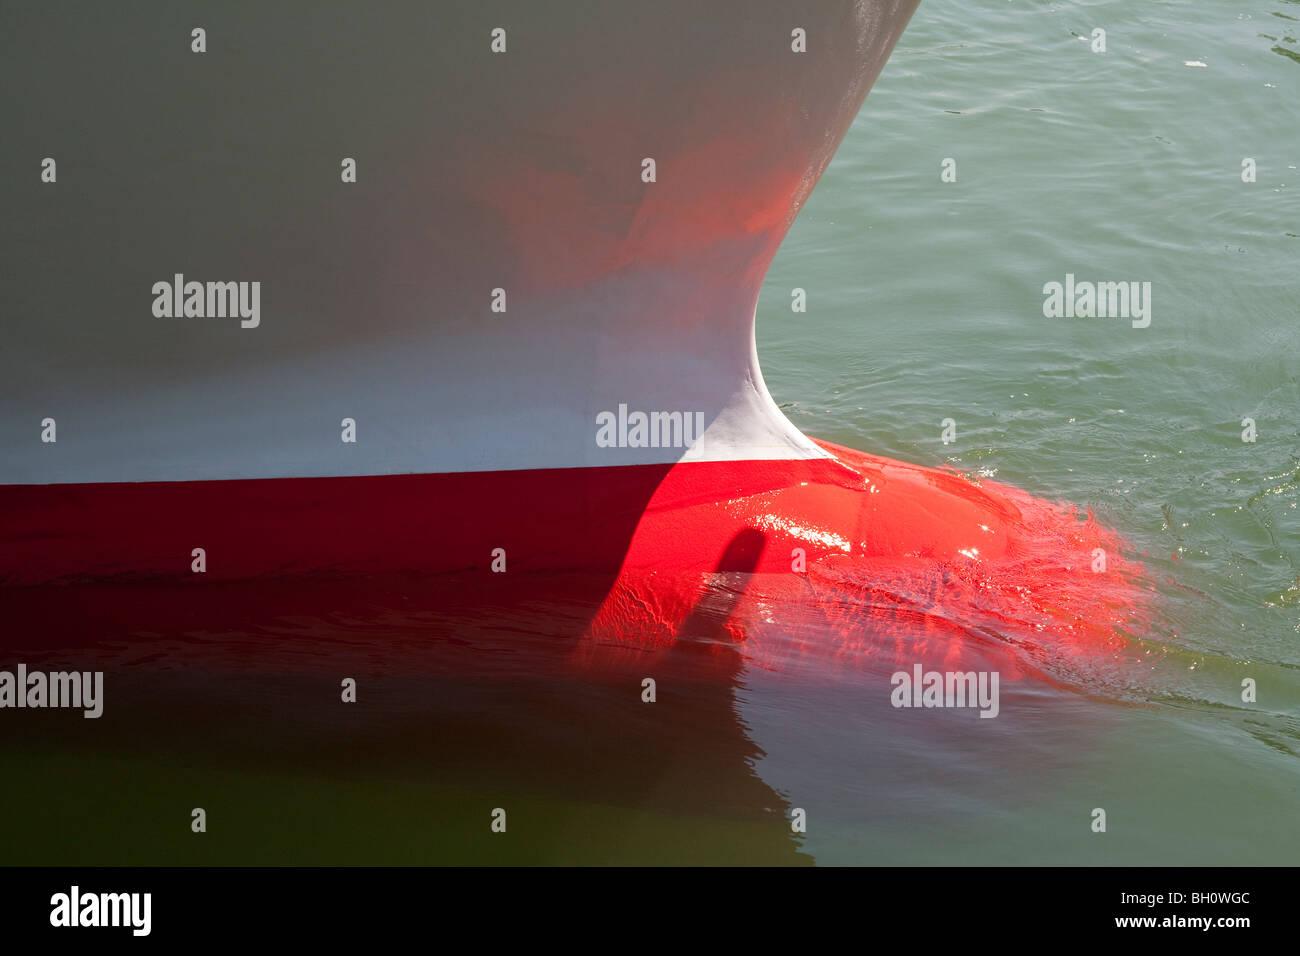 BULBOUS BOW, RULK, EXCURSION BOAT, CHIEMSEE LAKE, CHIEMGAU, BAVARIA, GERMANY - Stock Image